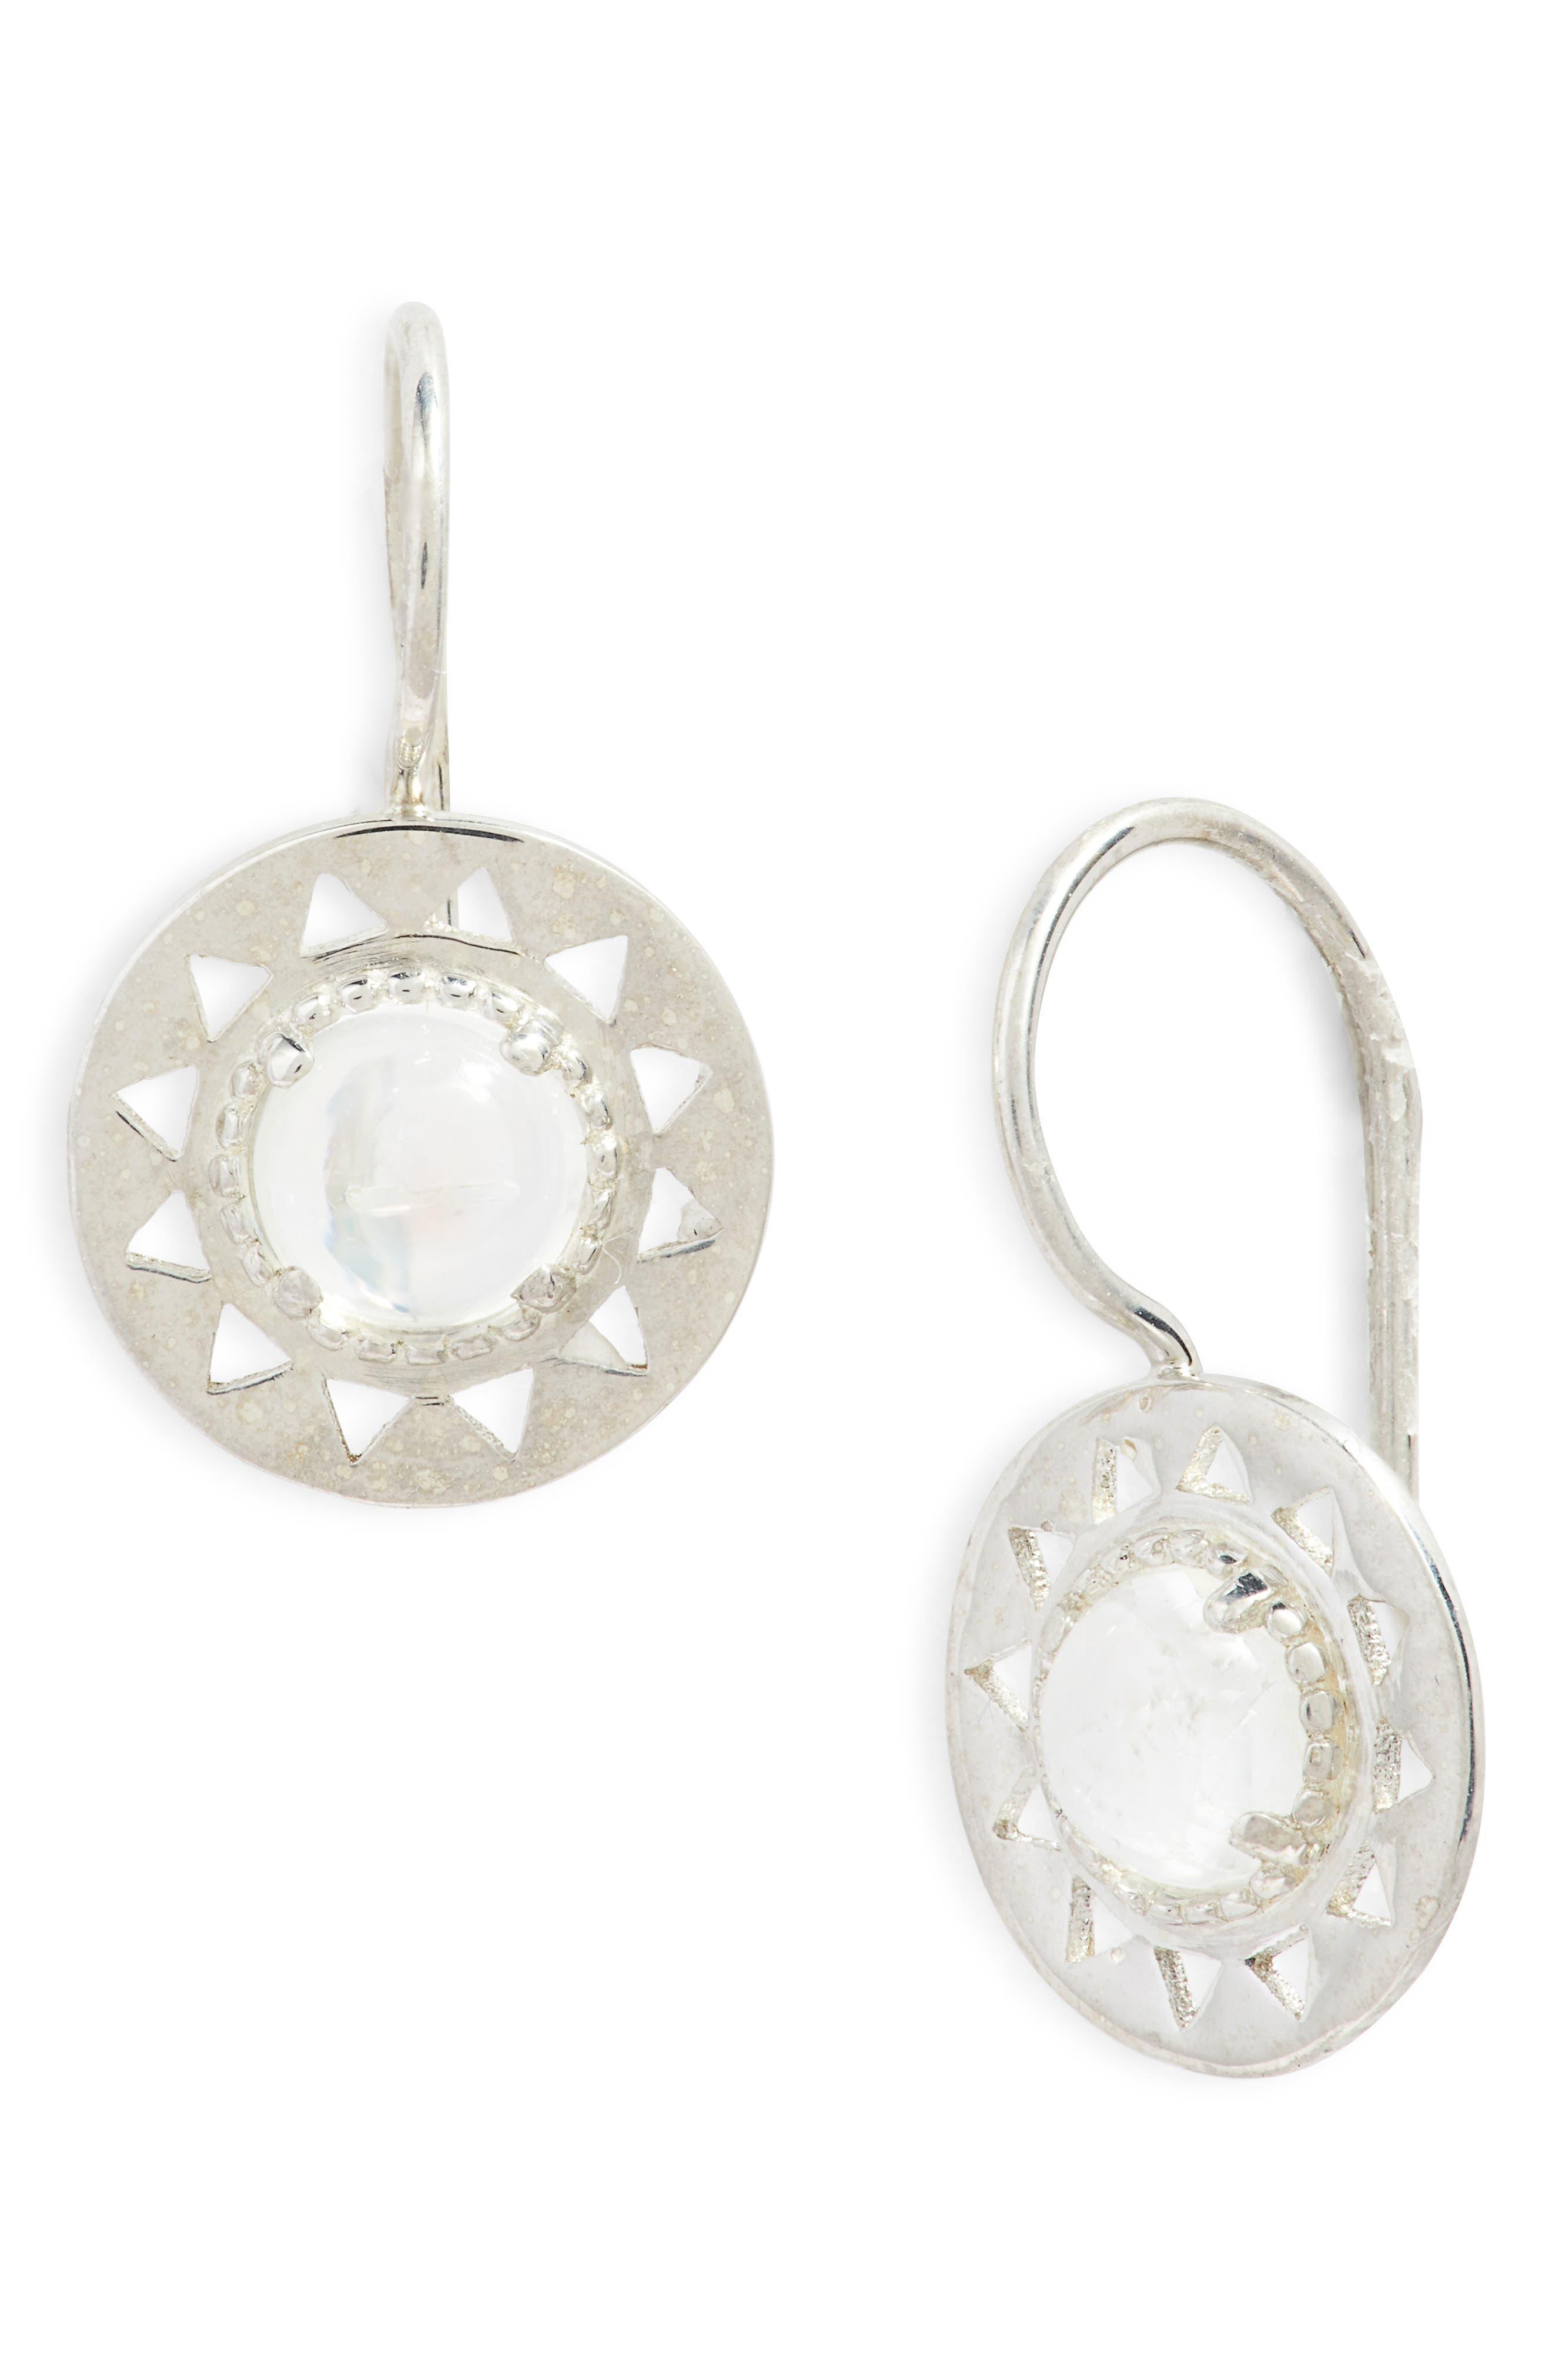 Aztec Moonstone Drop Earrings,                         Main,                         color, SILVER